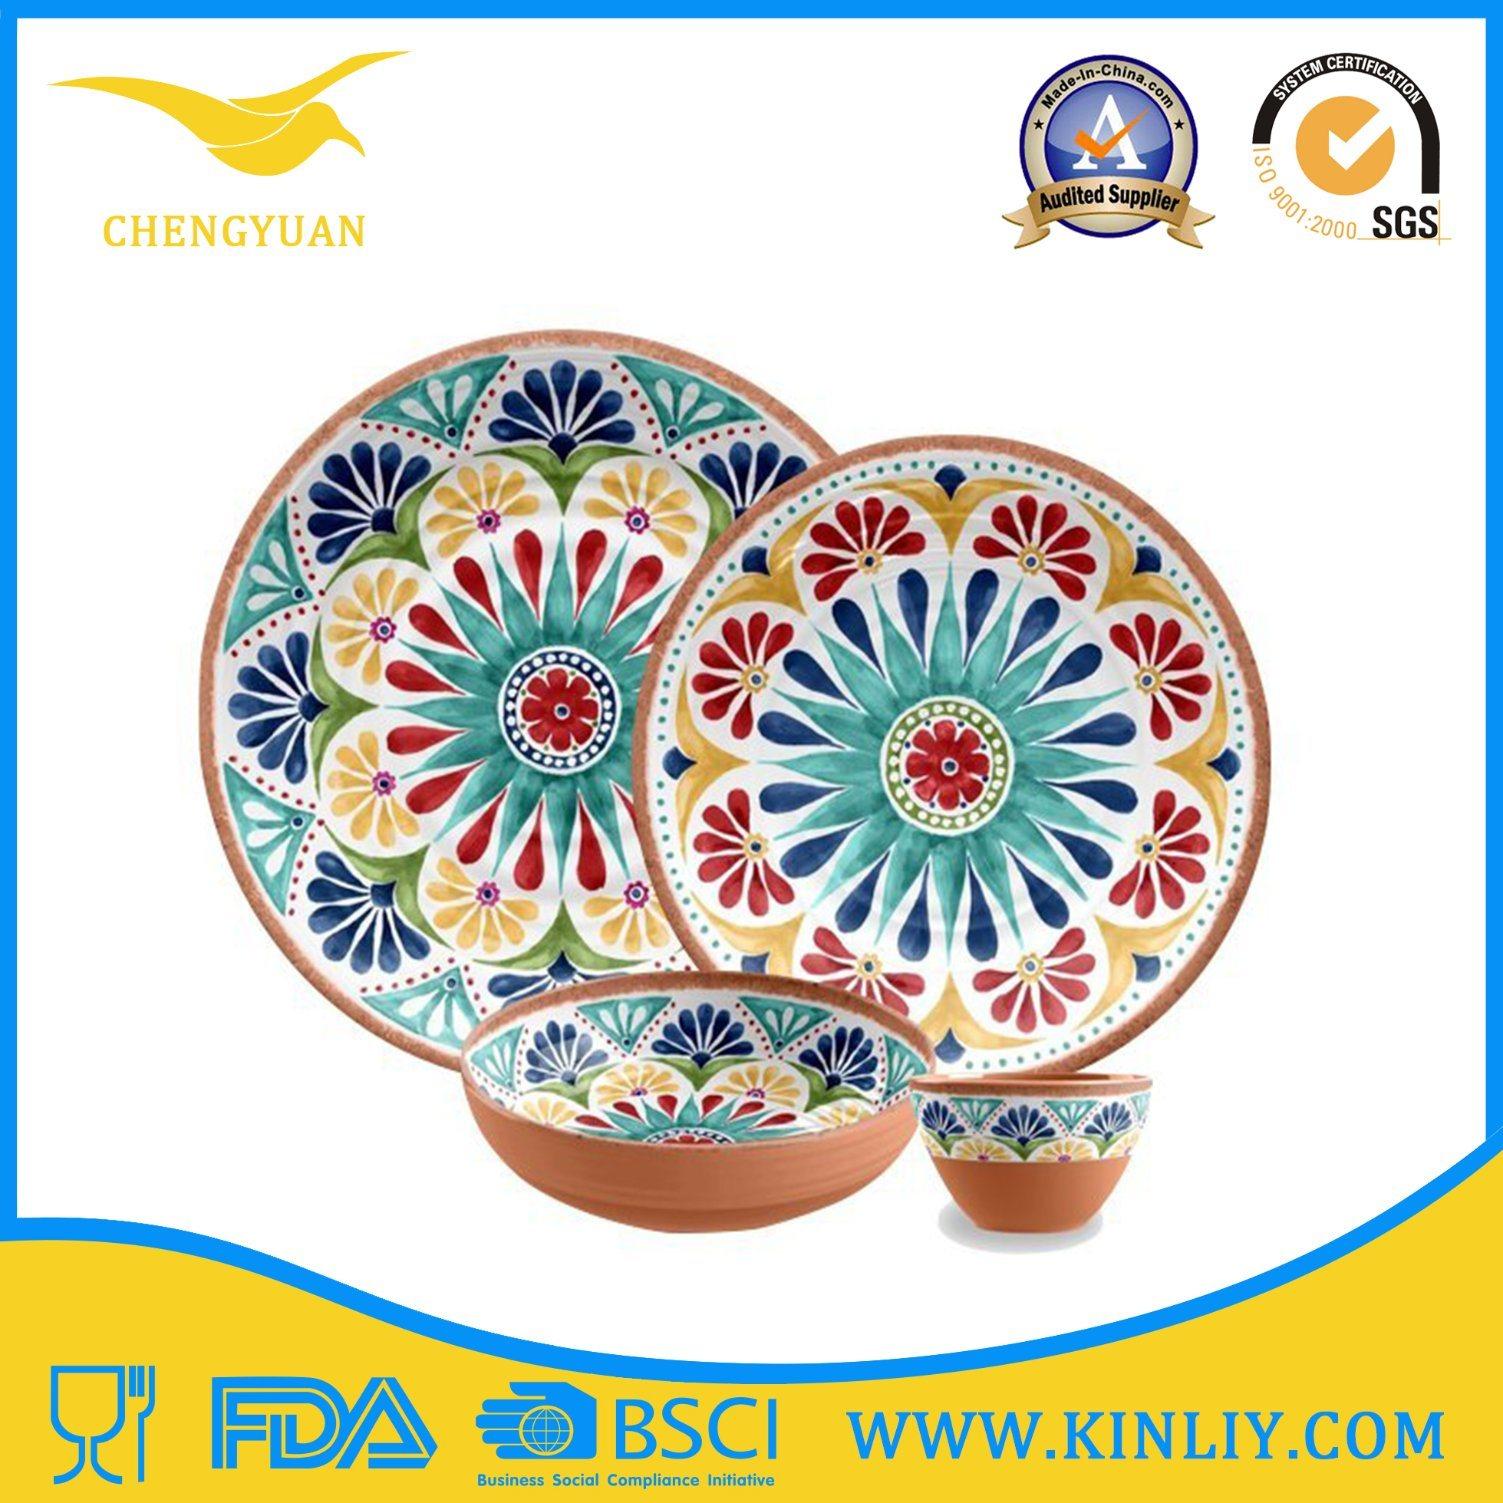 Cheap European China India Melamine Plastic Restaurant Safe Round Square Modern Home Food Set Dish Dishware Dinner Plate Set Cup Bowl Tray Tableware Dinnerware